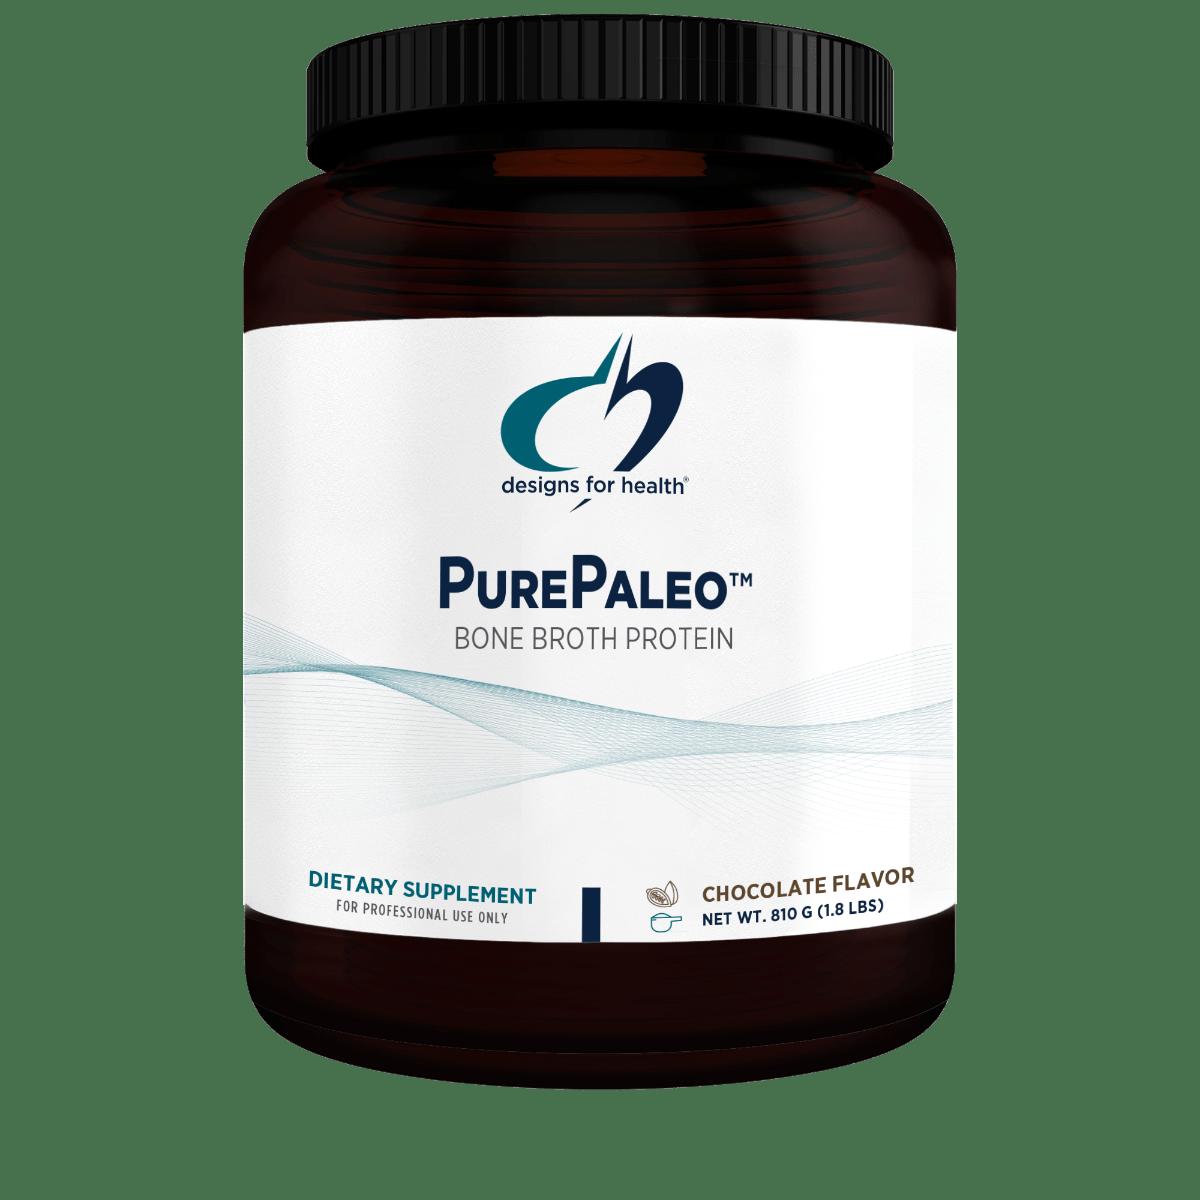 PurePaleo (Chocolate) 810 g (1.8 lbs) Designs for Health